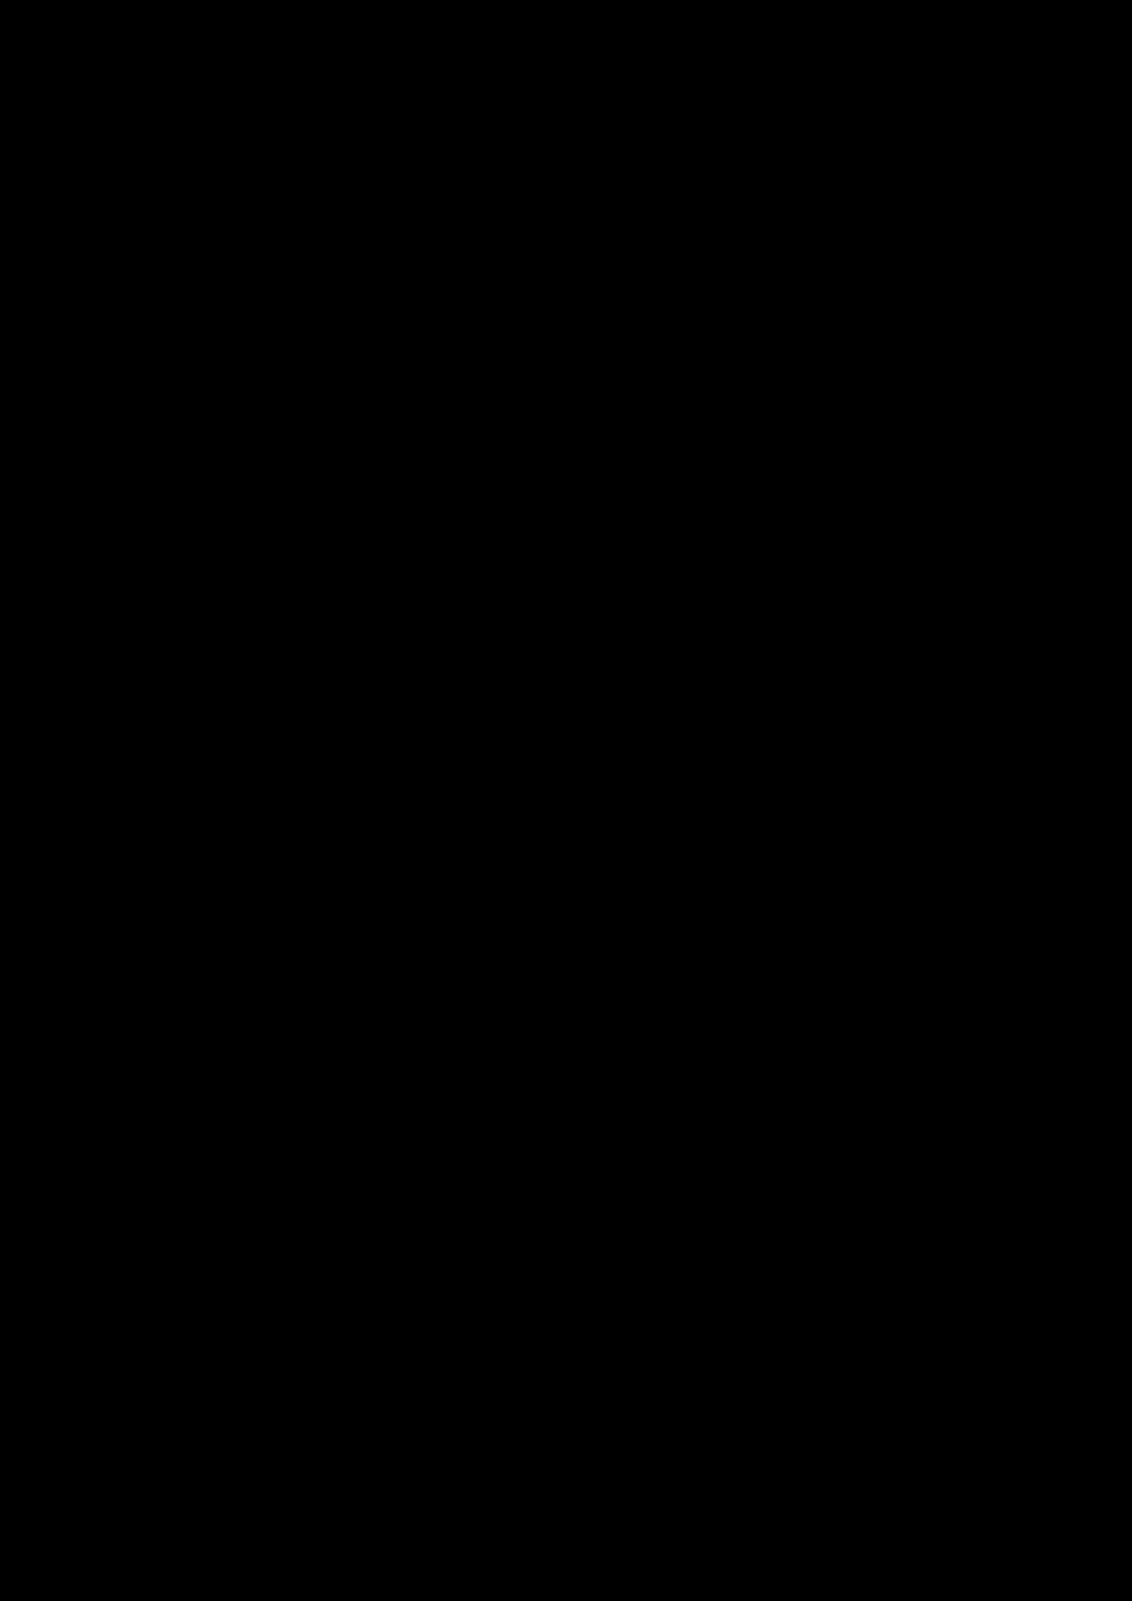 Korolevstvo slez slide, Image 14